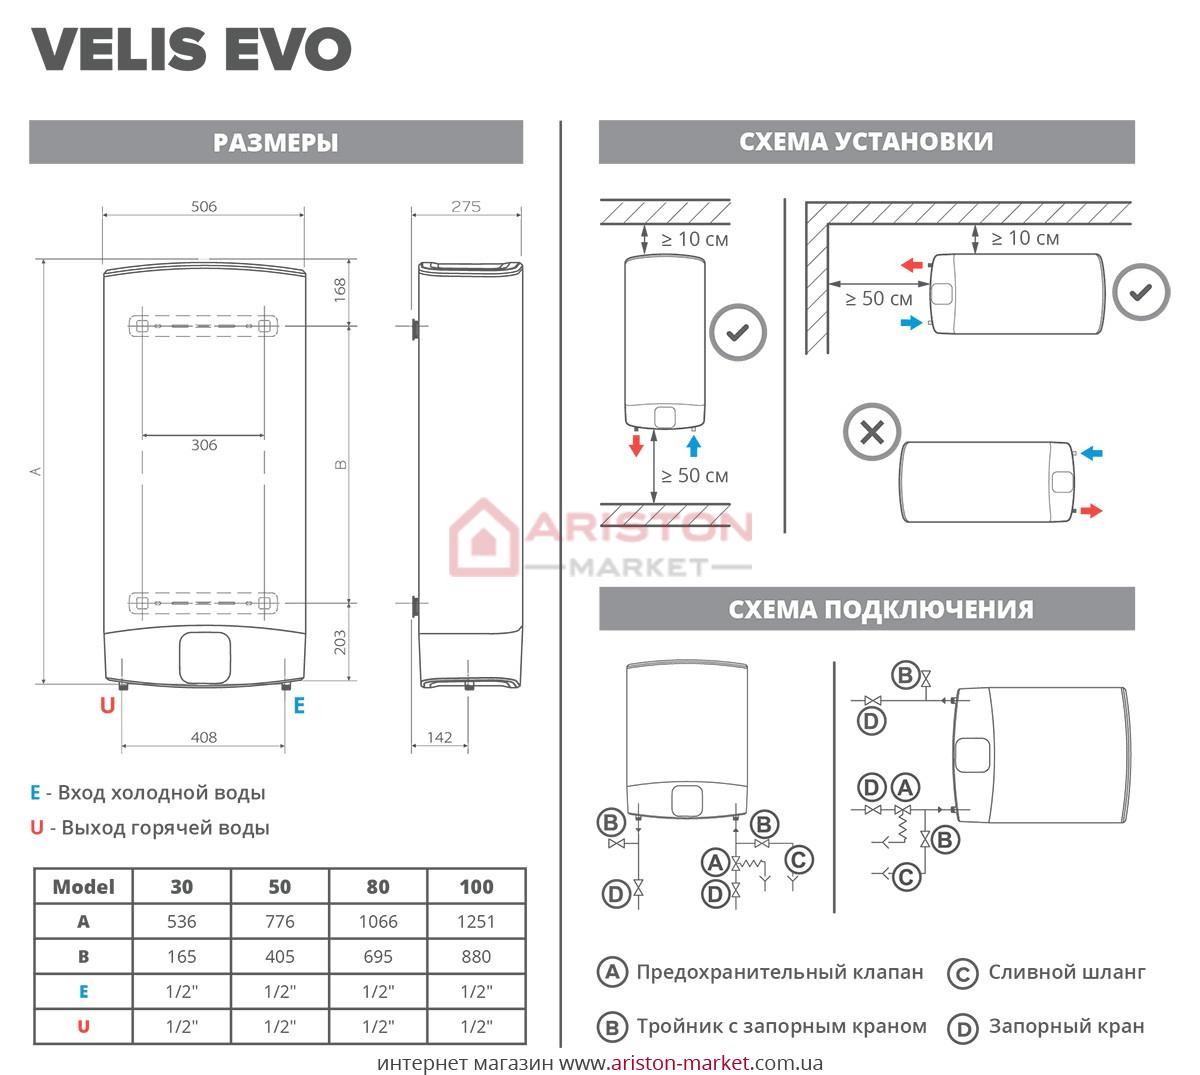 Ariston ABS Velis Evo Power 30 D схема, габариты, чертеж